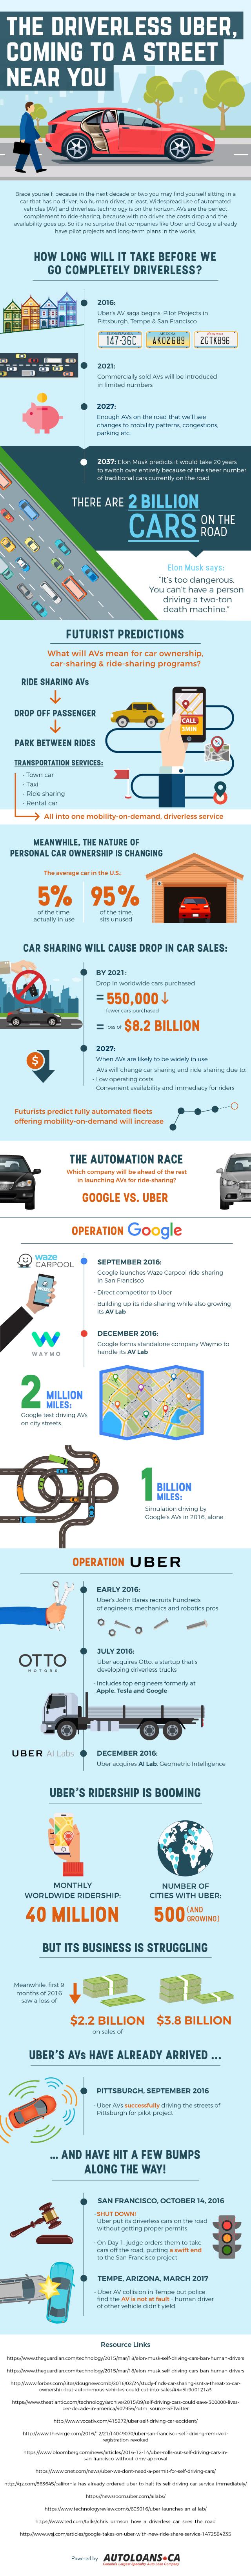 the-driverless-uber